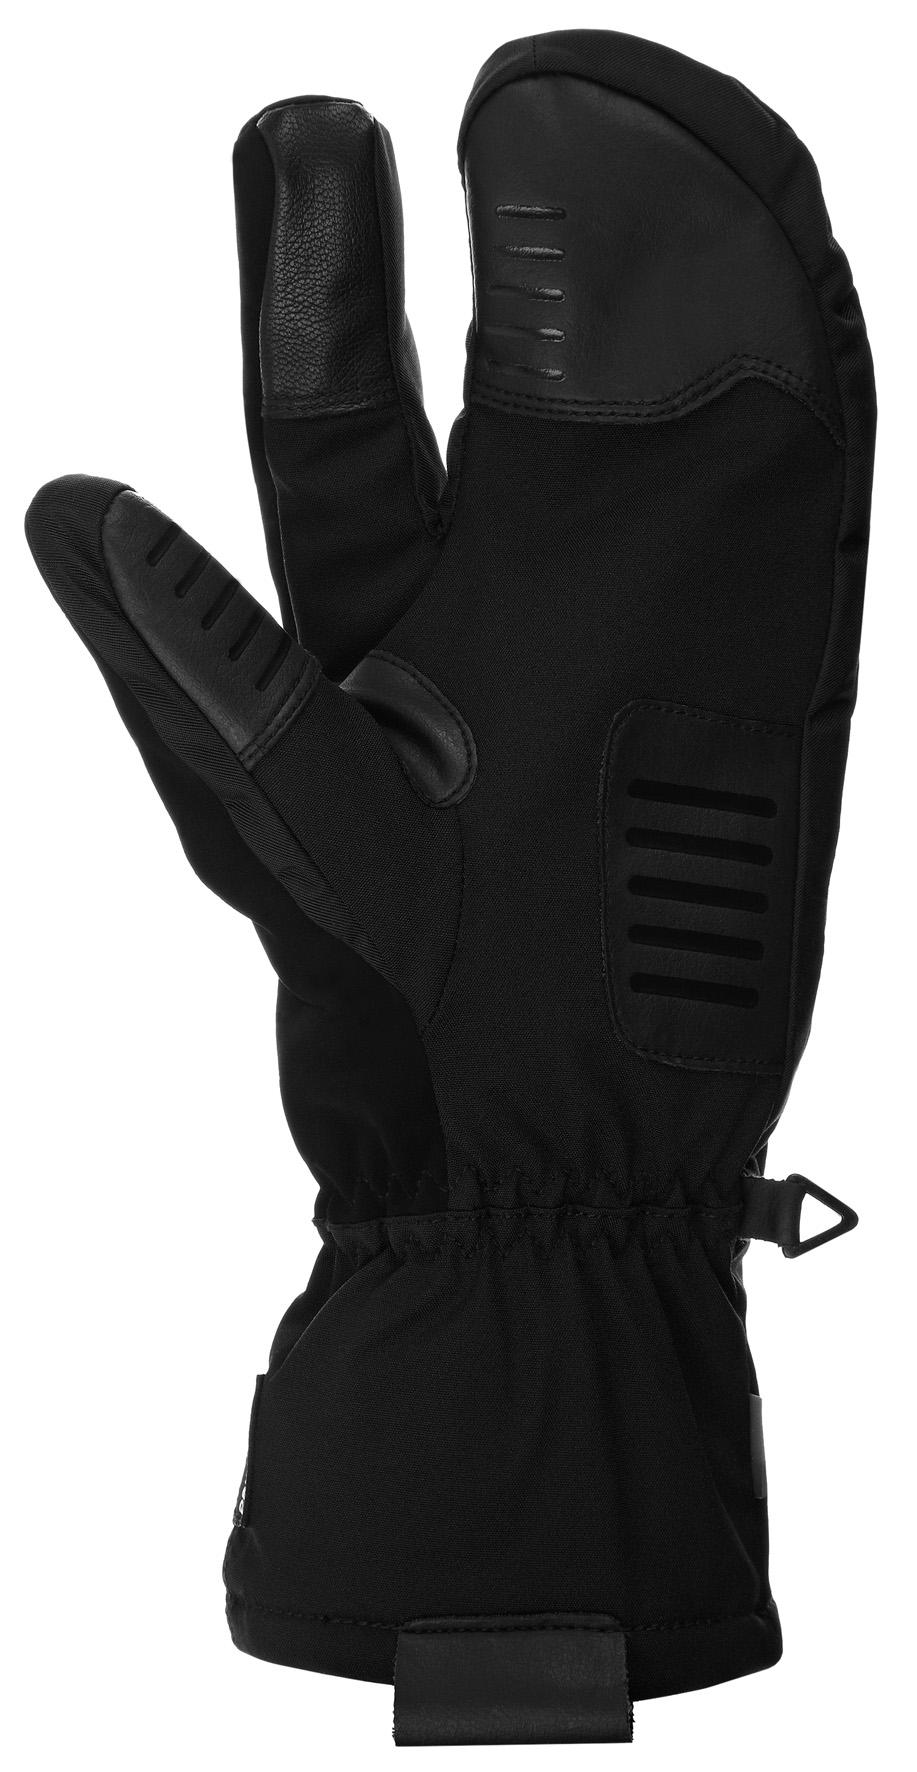 Vaude Syberia Gloves III 05361 Black - zateplené 3-prsté rukavice ... dade3de67a